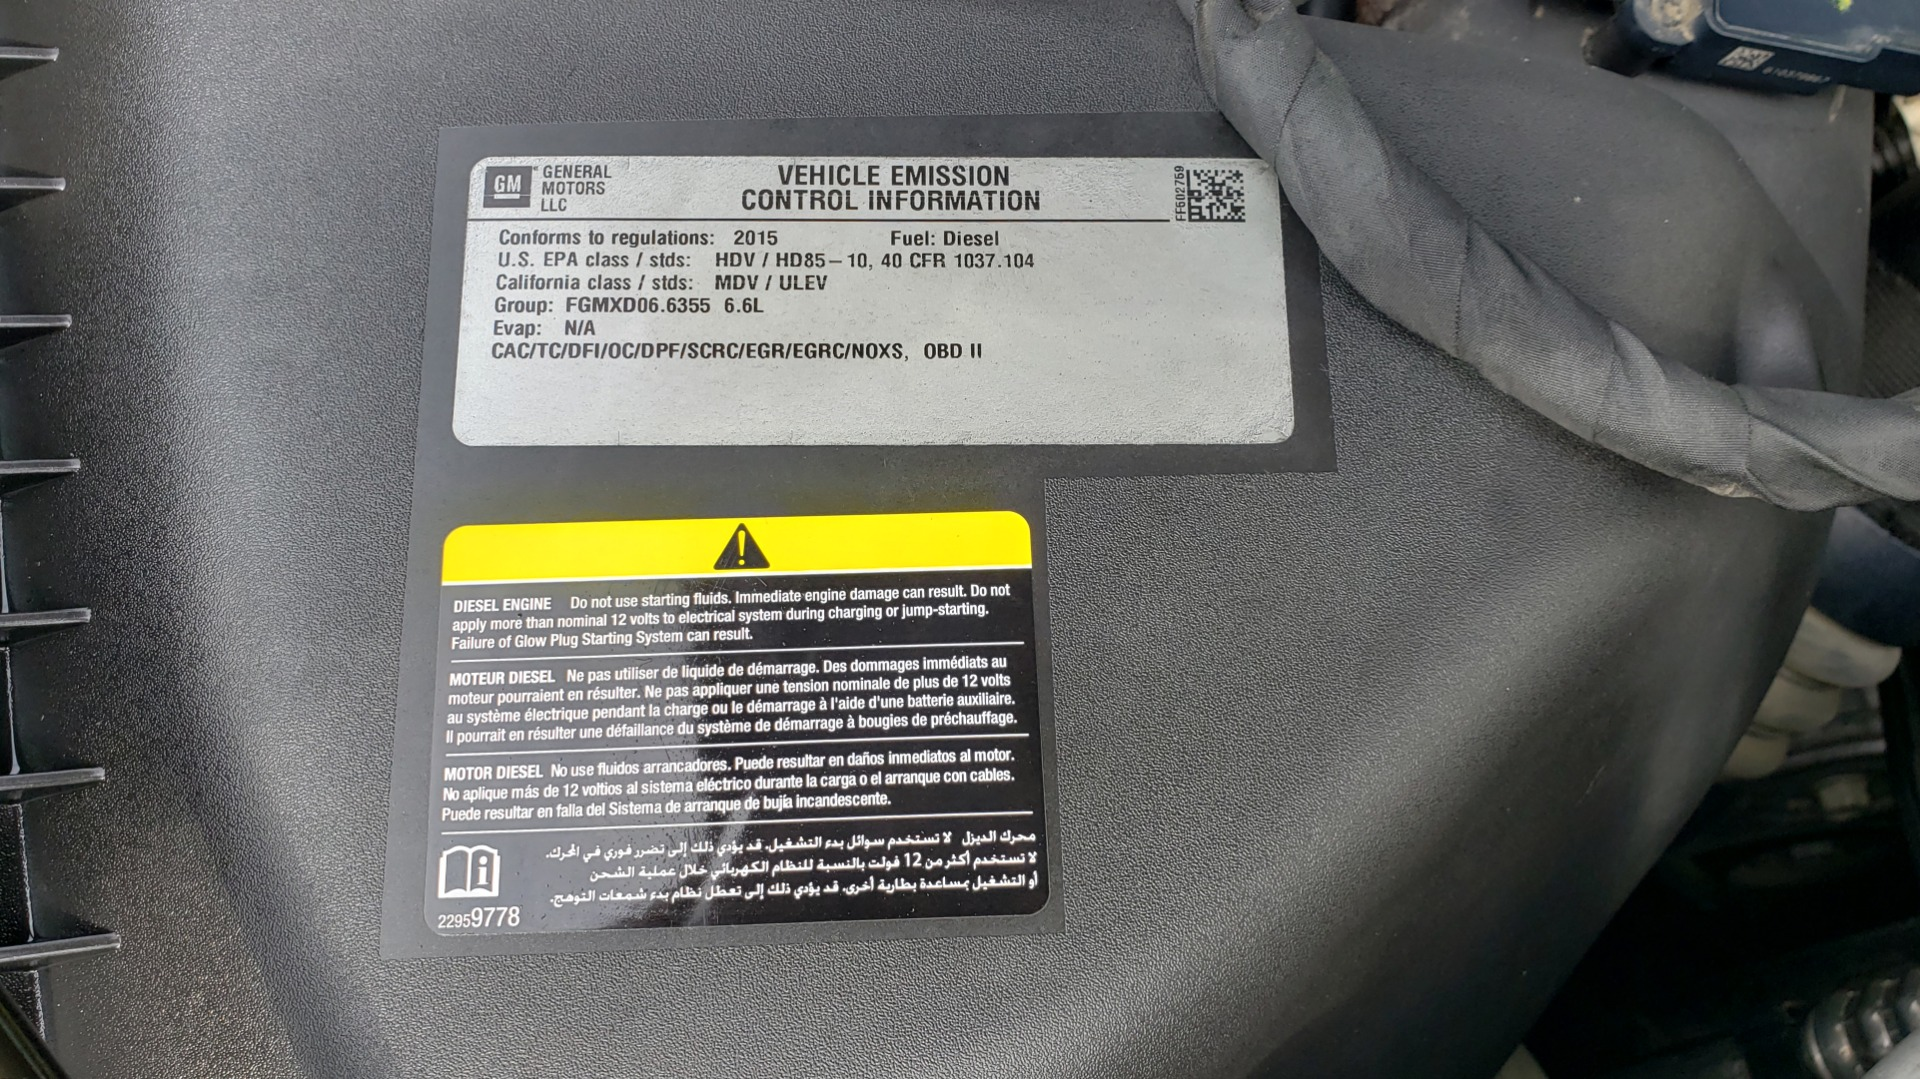 Used 2015 GMC SIERRA 2500HD DENALI / WIFI / NAV / DURAMAX PLUS / DRVR ALERT / SUNROOF / REARVIEW for sale $56,995 at Formula Imports in Charlotte NC 28227 11